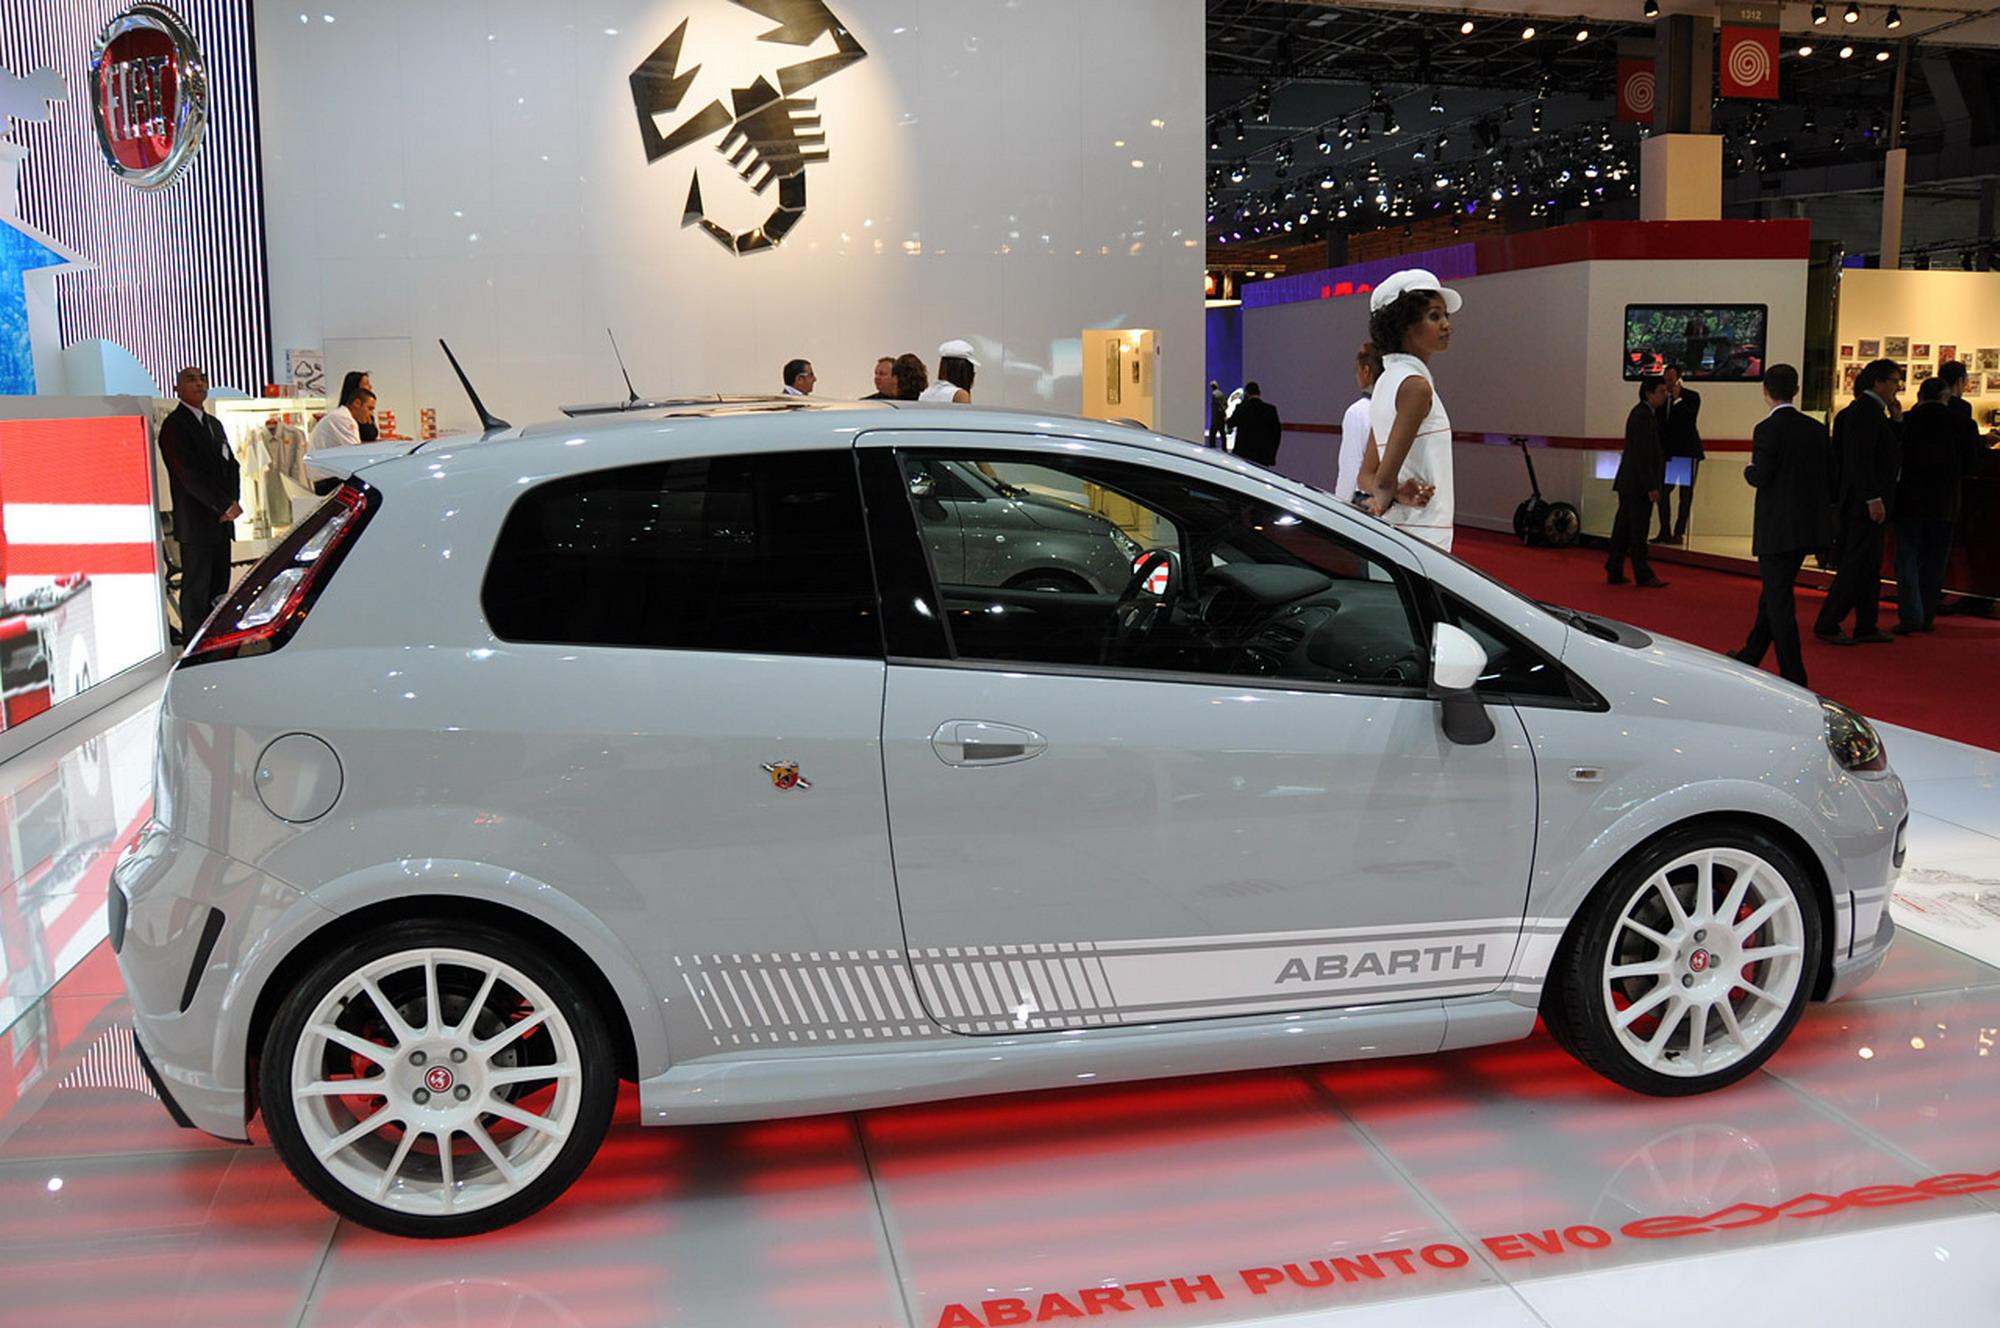 2011-Fiat-Punto-Evo-Abarth-EsseEsse-price1 - The FIAT Forum - Photo